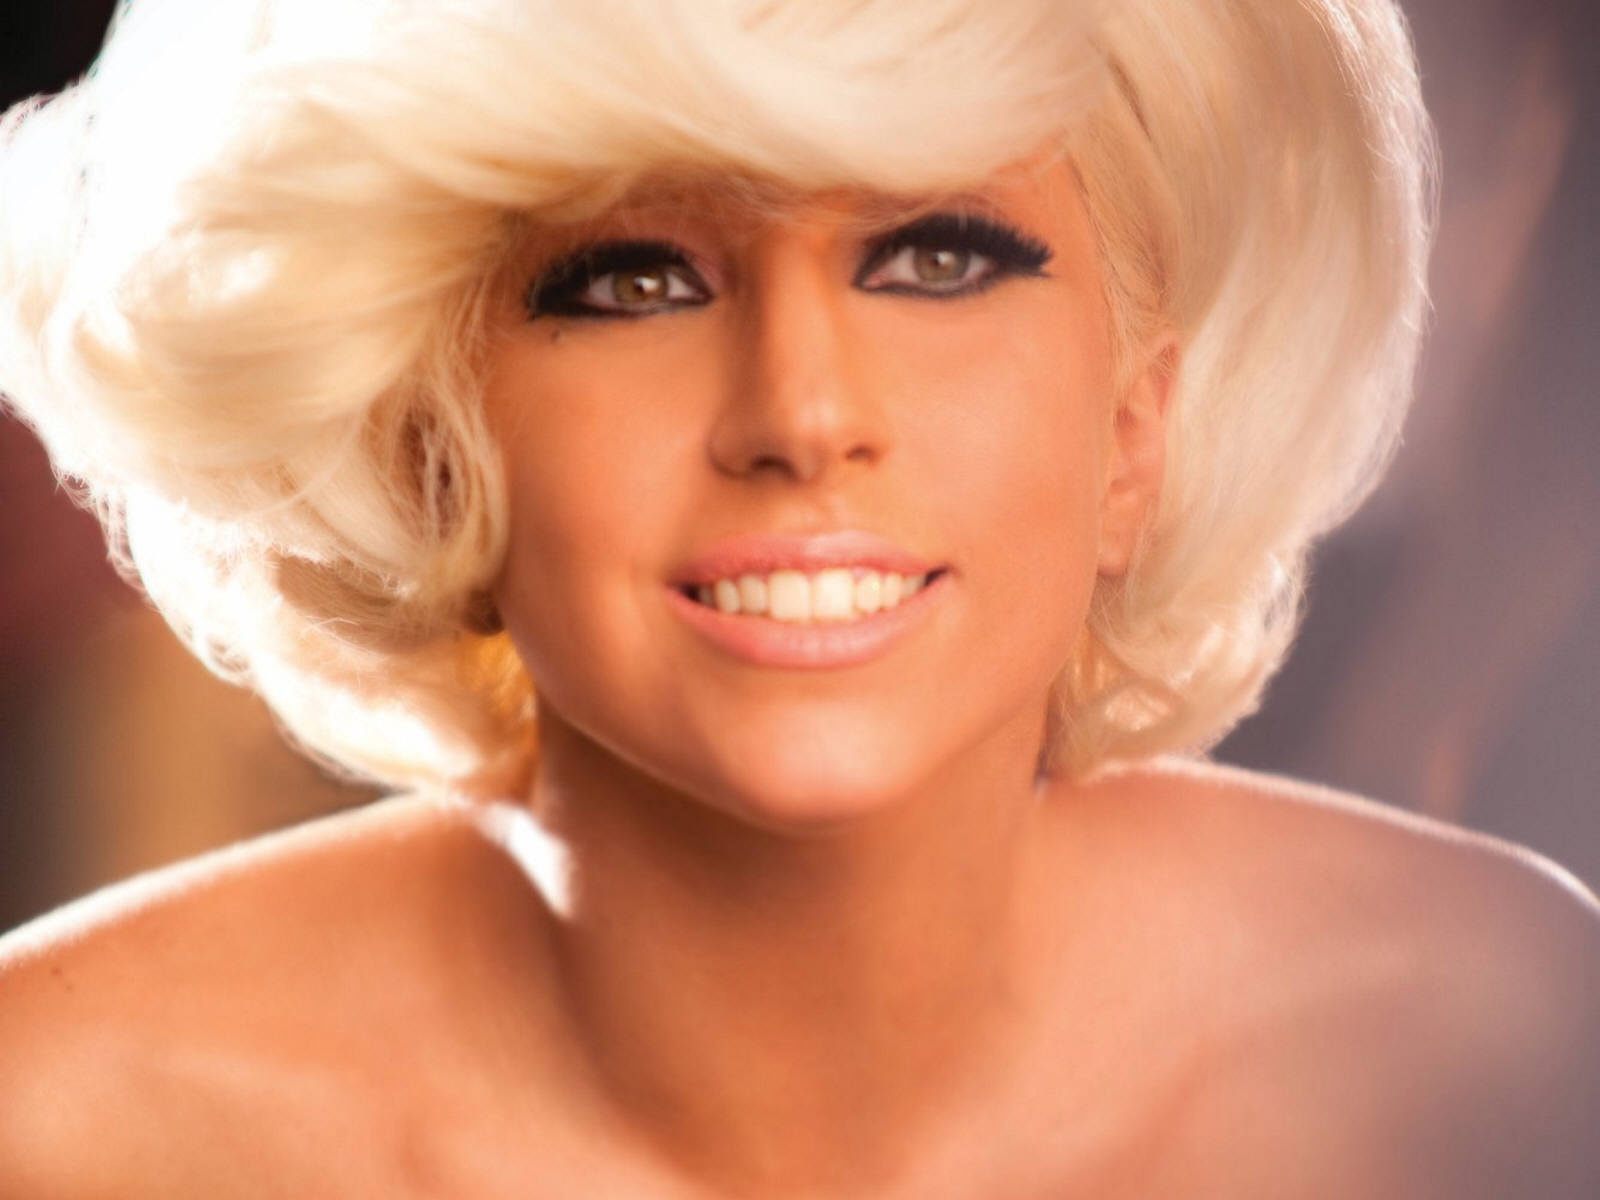 http://2.bp.blogspot.com/-8OPq_g1AWLw/Trw2Mr3yHZI/AAAAAAAAAlQ/wc9bbLbkwX8/s1600/Sexy-Lady-gaga-Wallpaper-lady-gaga-10606210-1600-1200.jpg